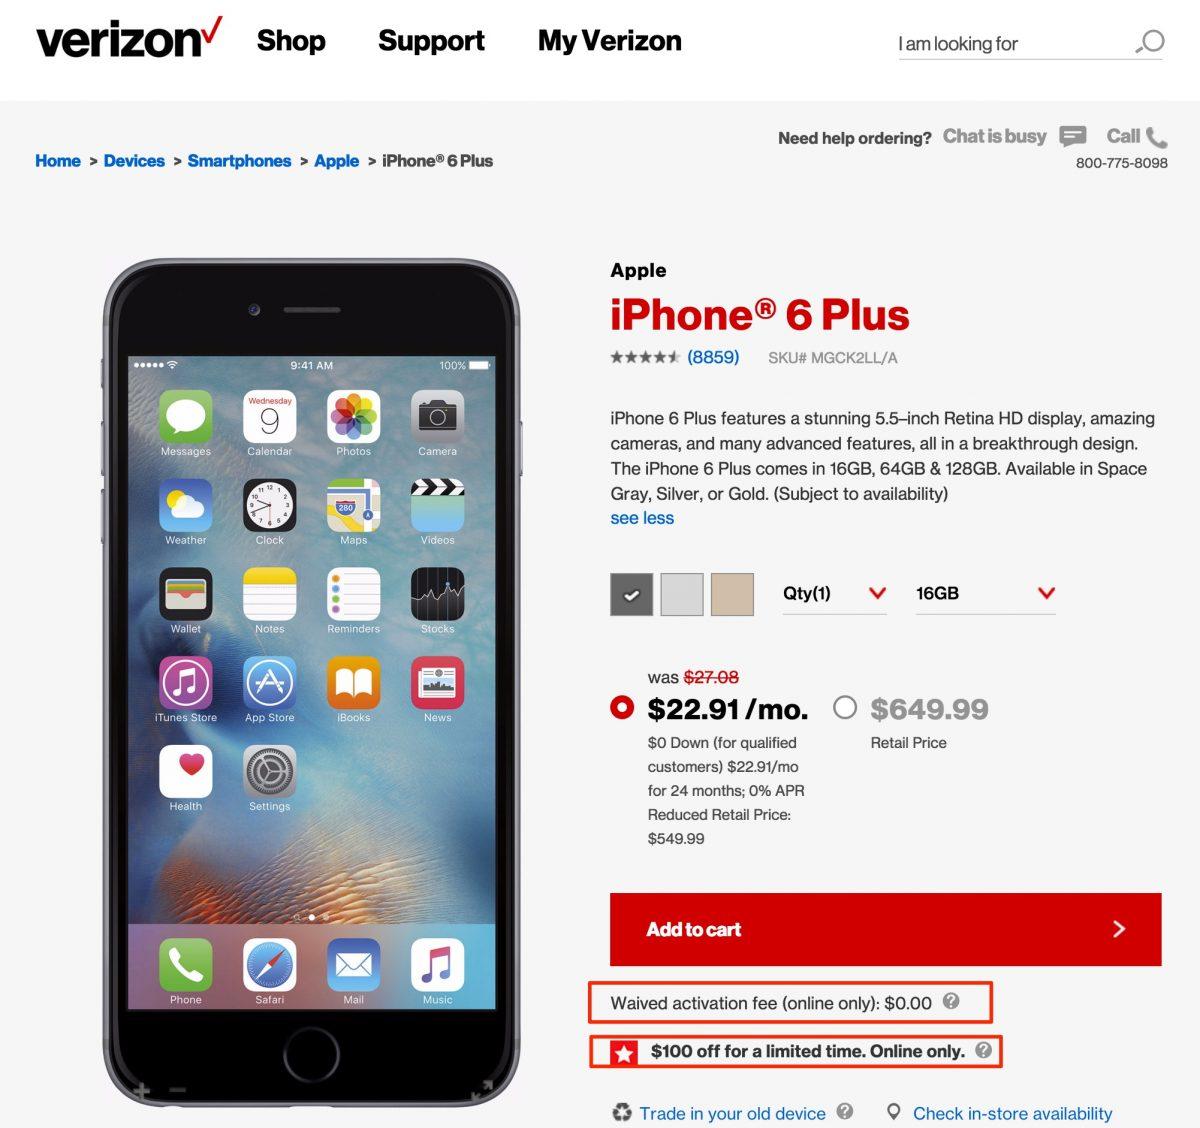 Verizon Memorial Day Online Sale: Take $100 Off IPhone 6